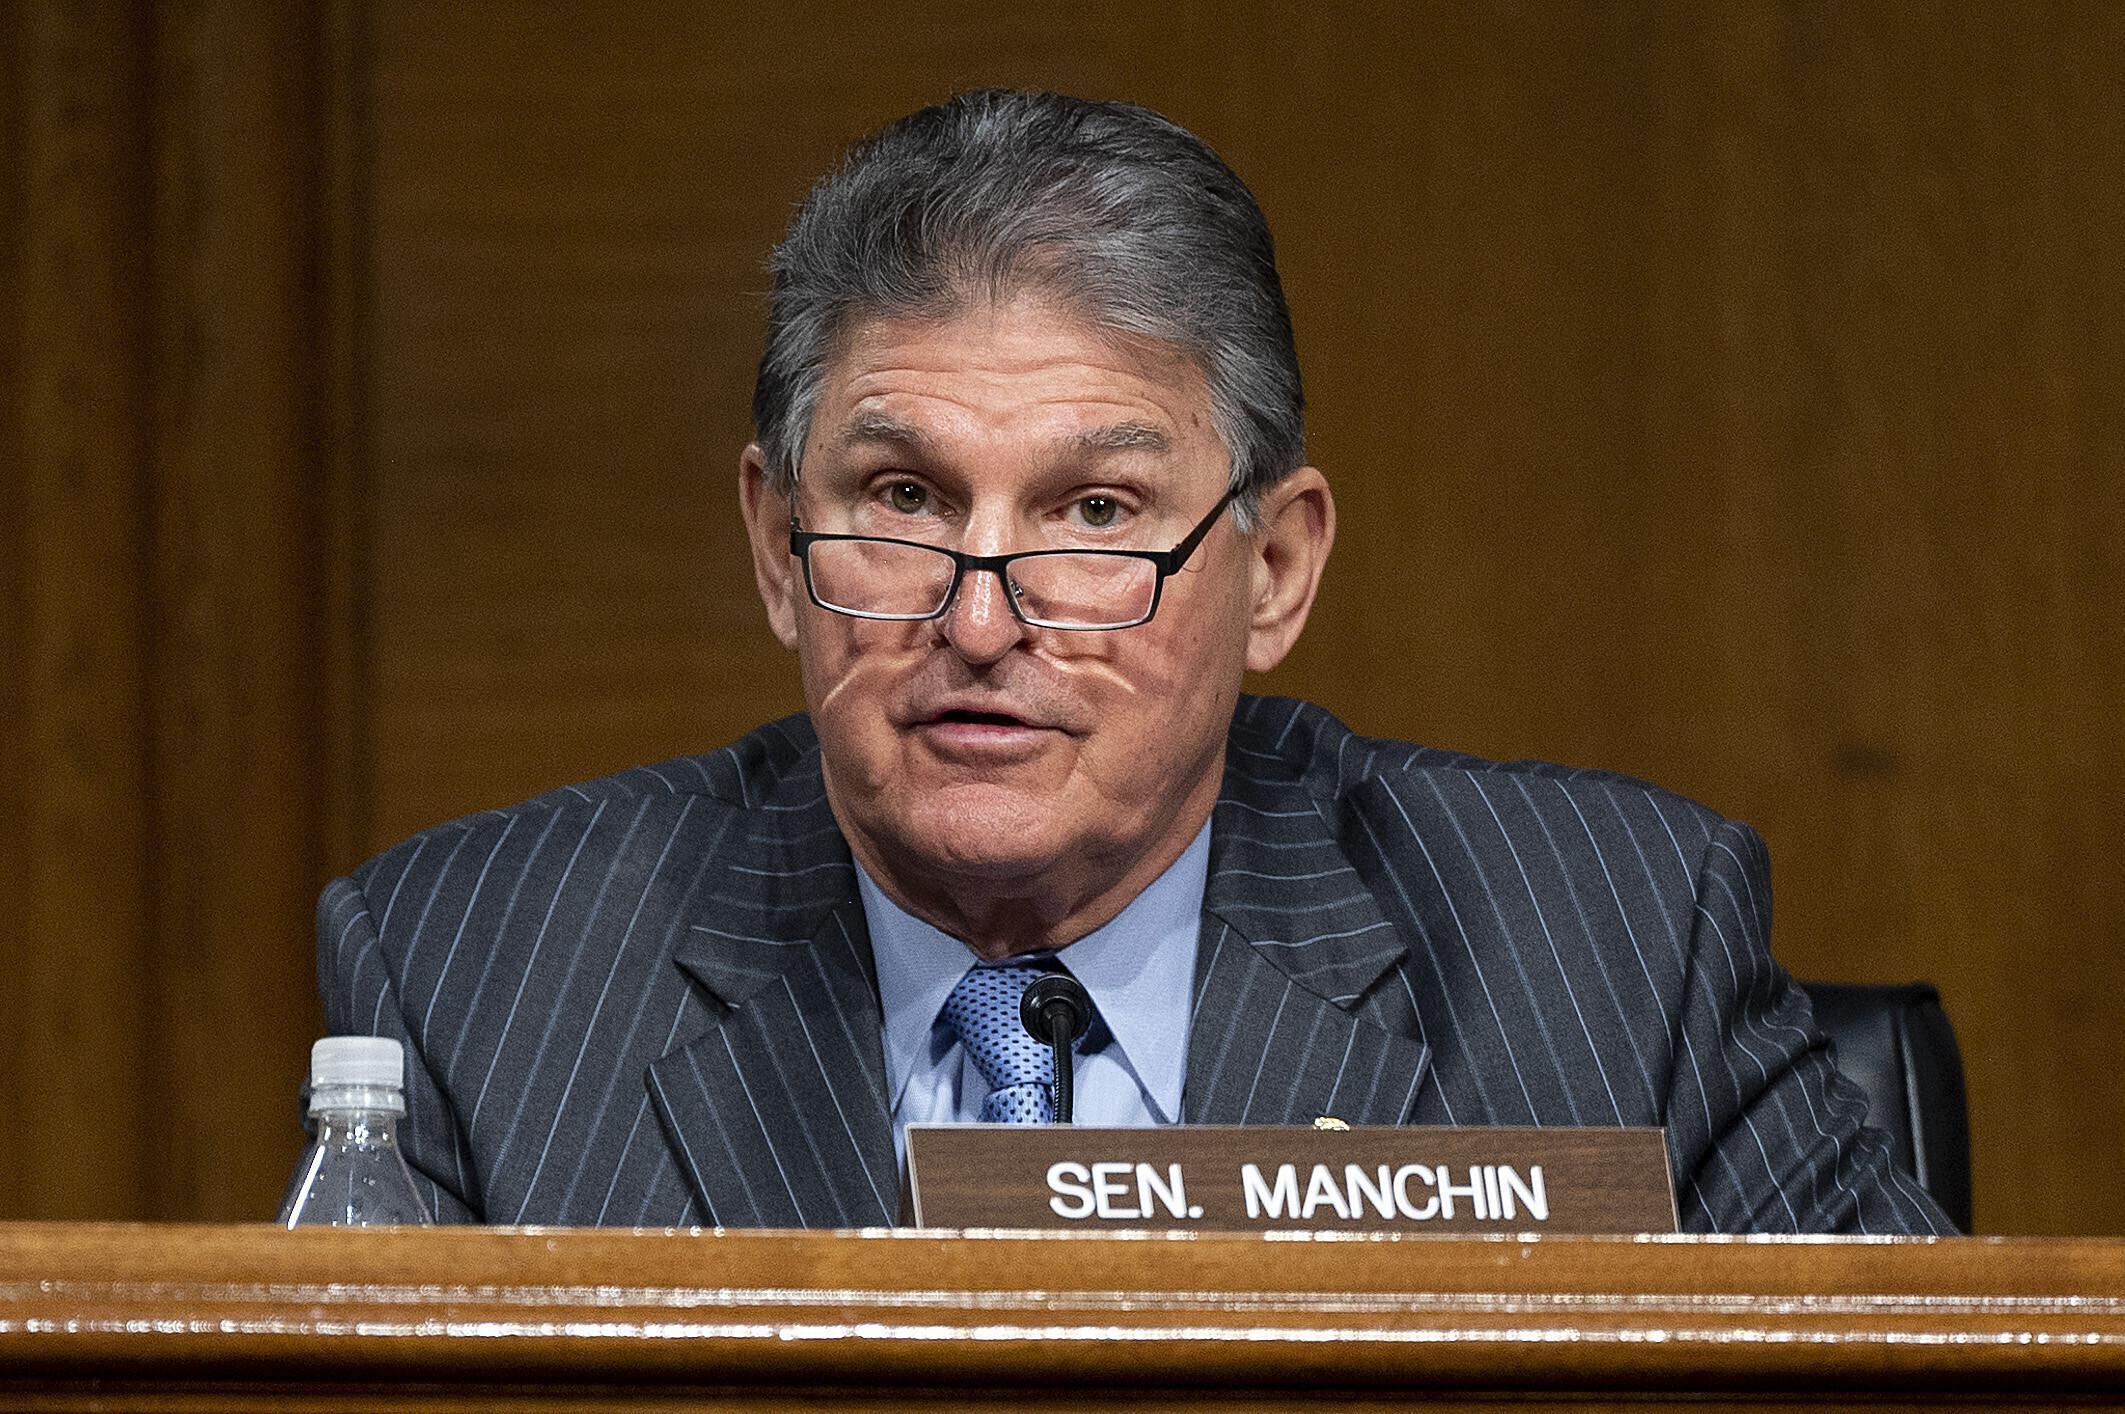 Dem Sen. Manchin asks Biden to reverse Keystone XL rejection – Associated Press